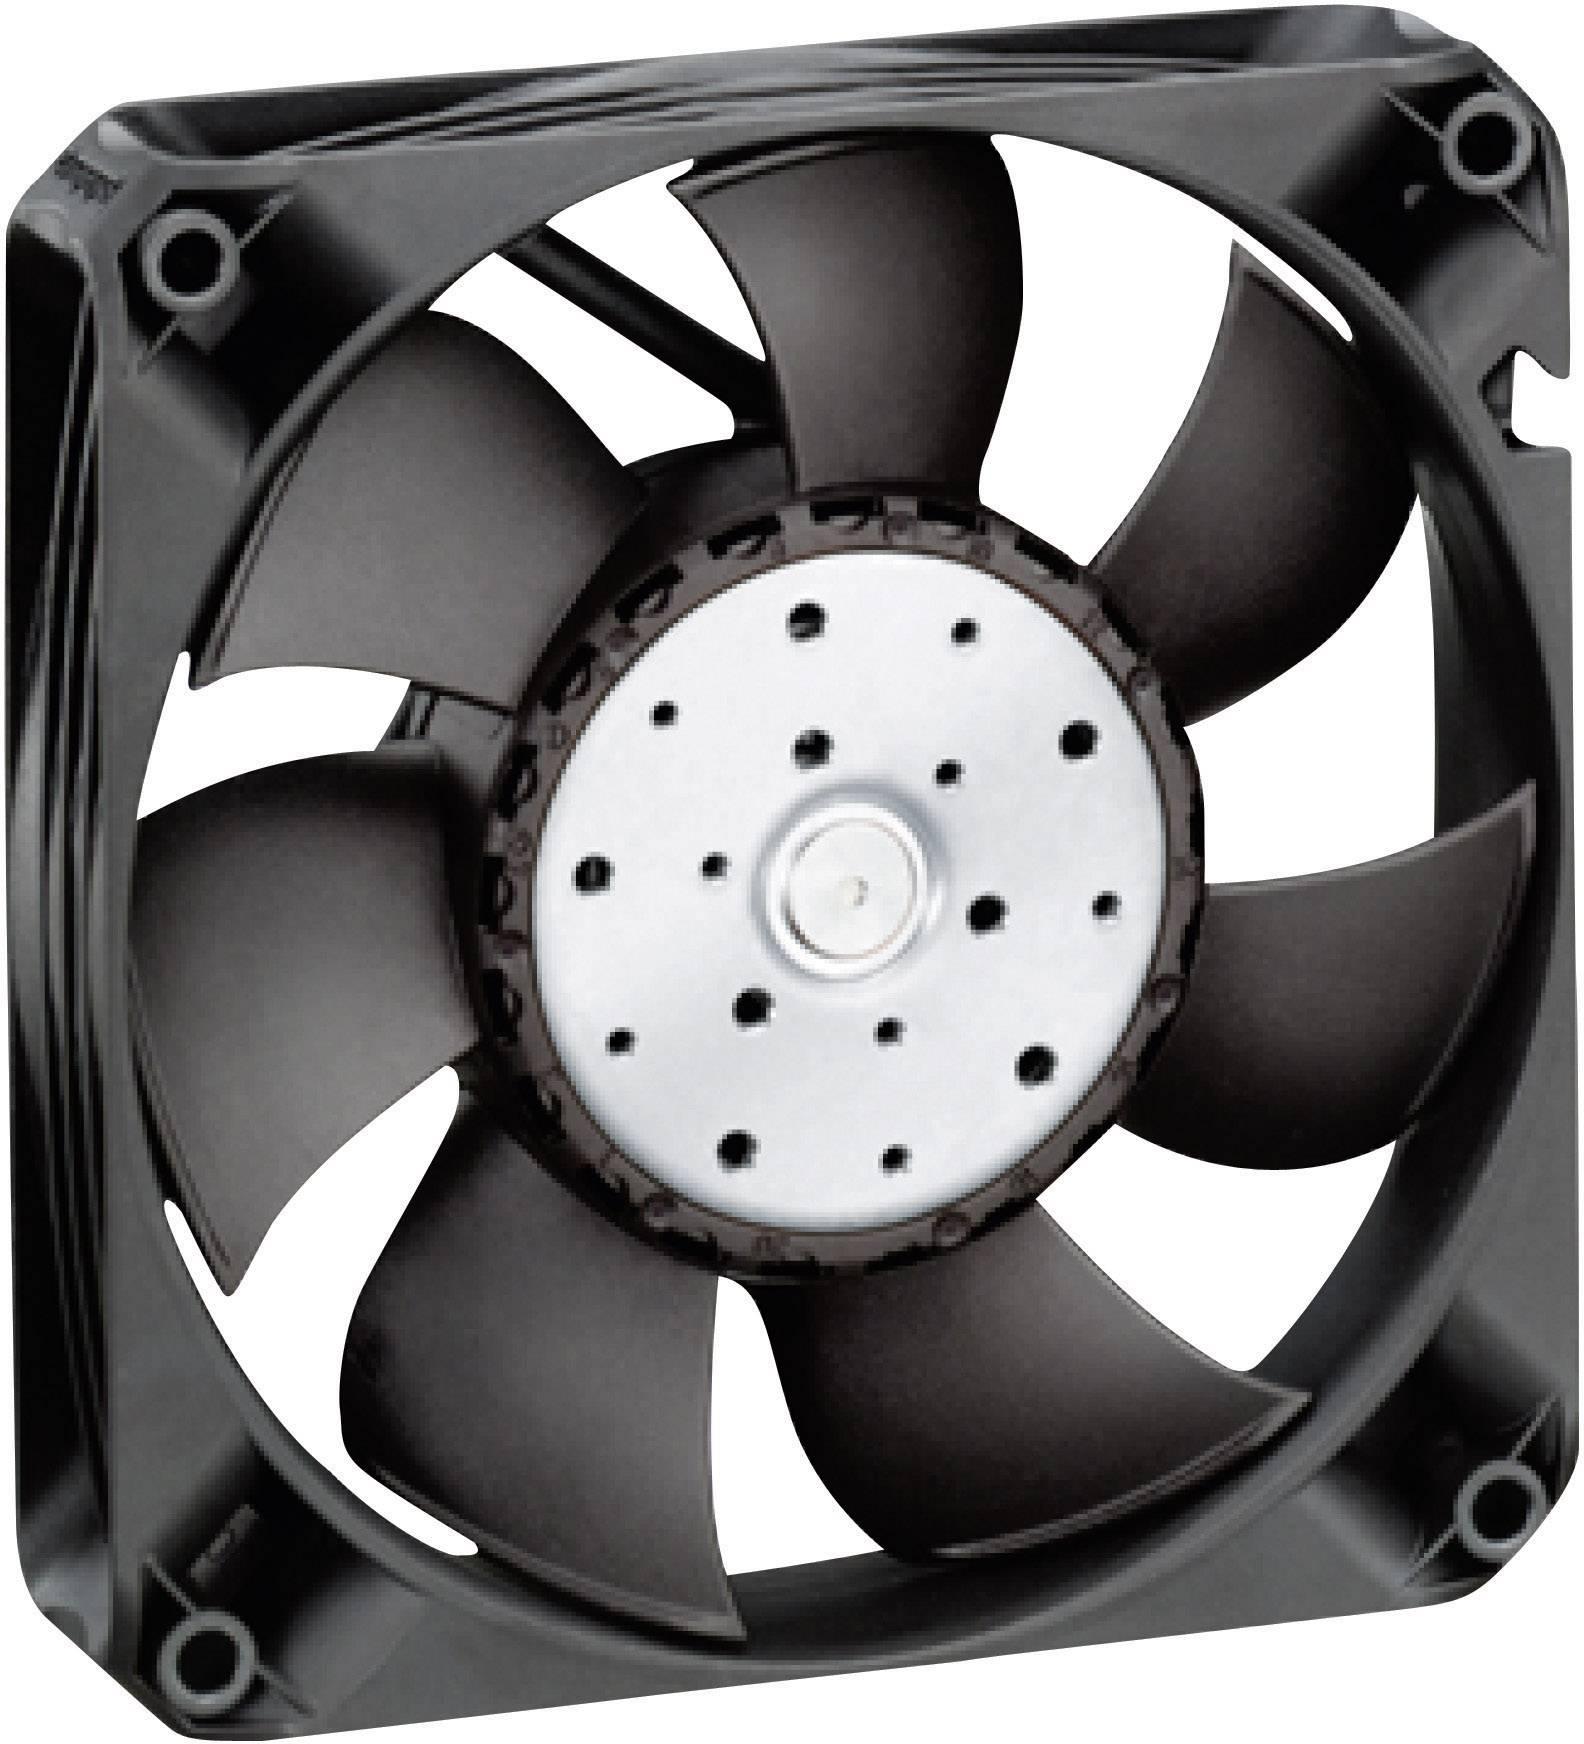 Axiální ventilátor EBM Papst, 4412 FNH, 12 V, 55 dBA, 119 x 119 x 25 mm